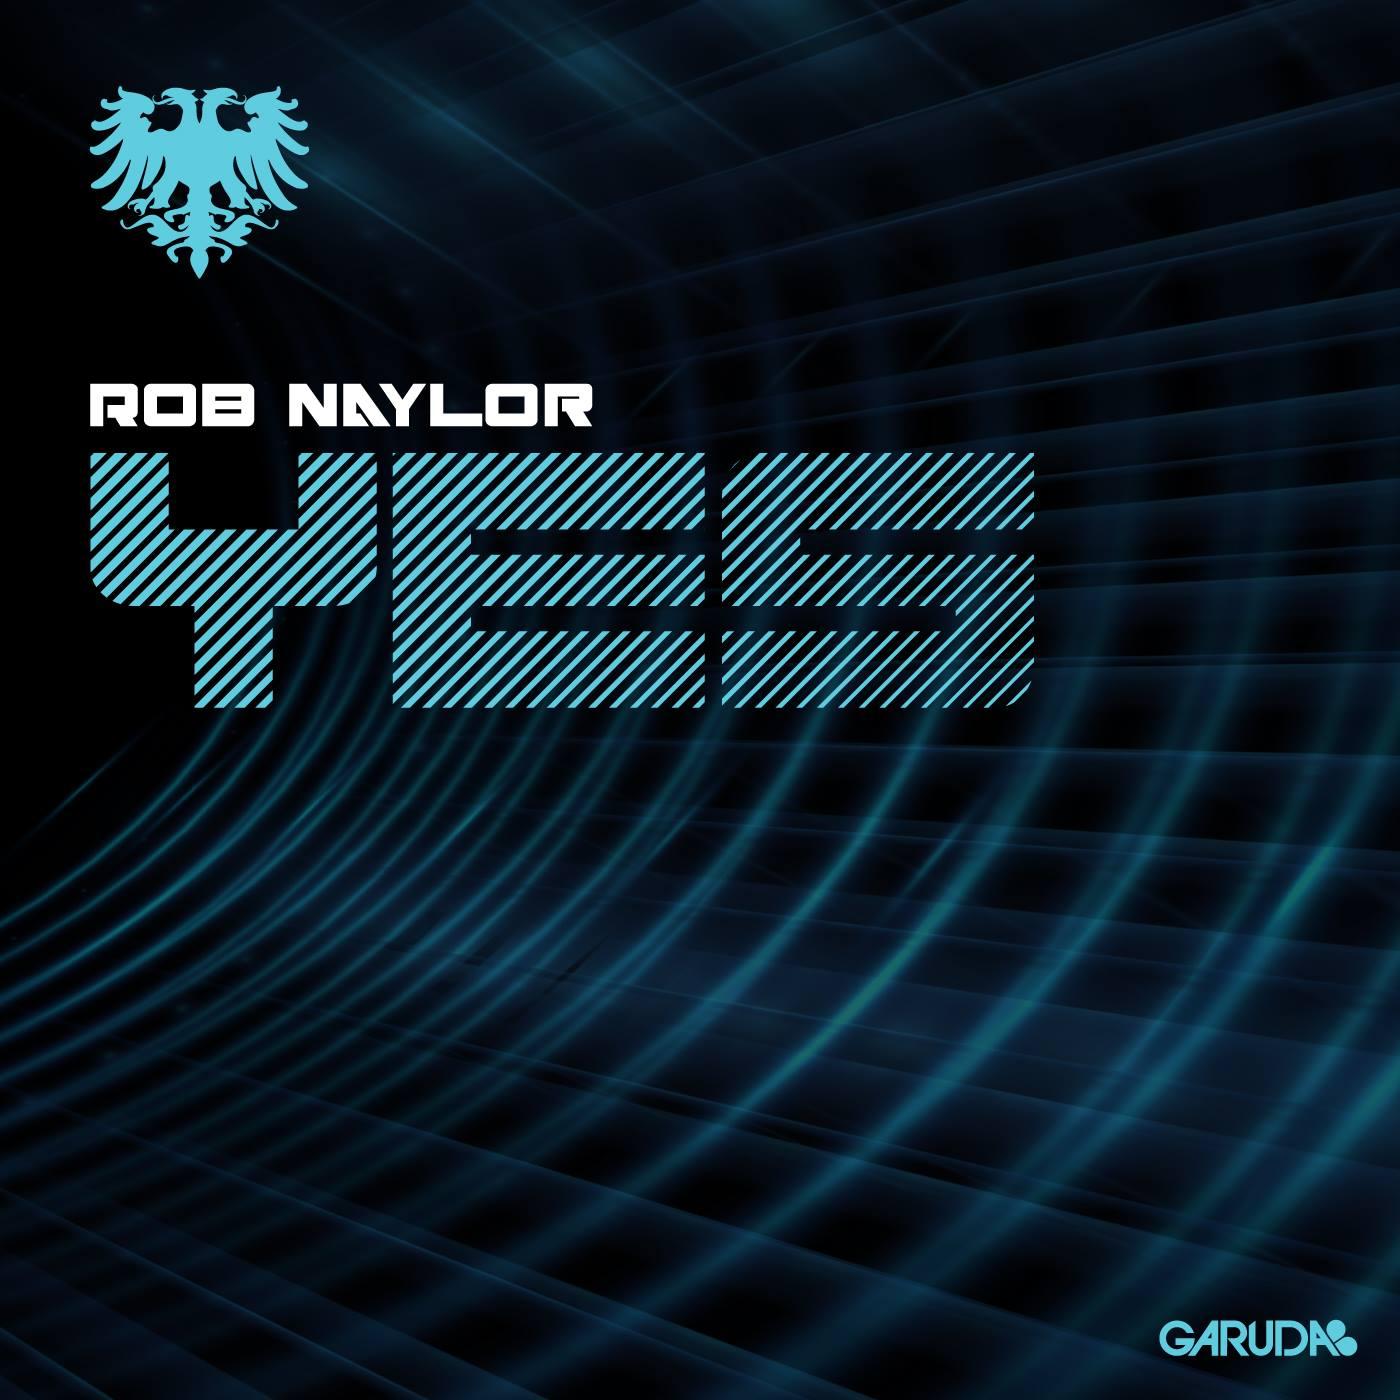 Rob Naylor- Yes